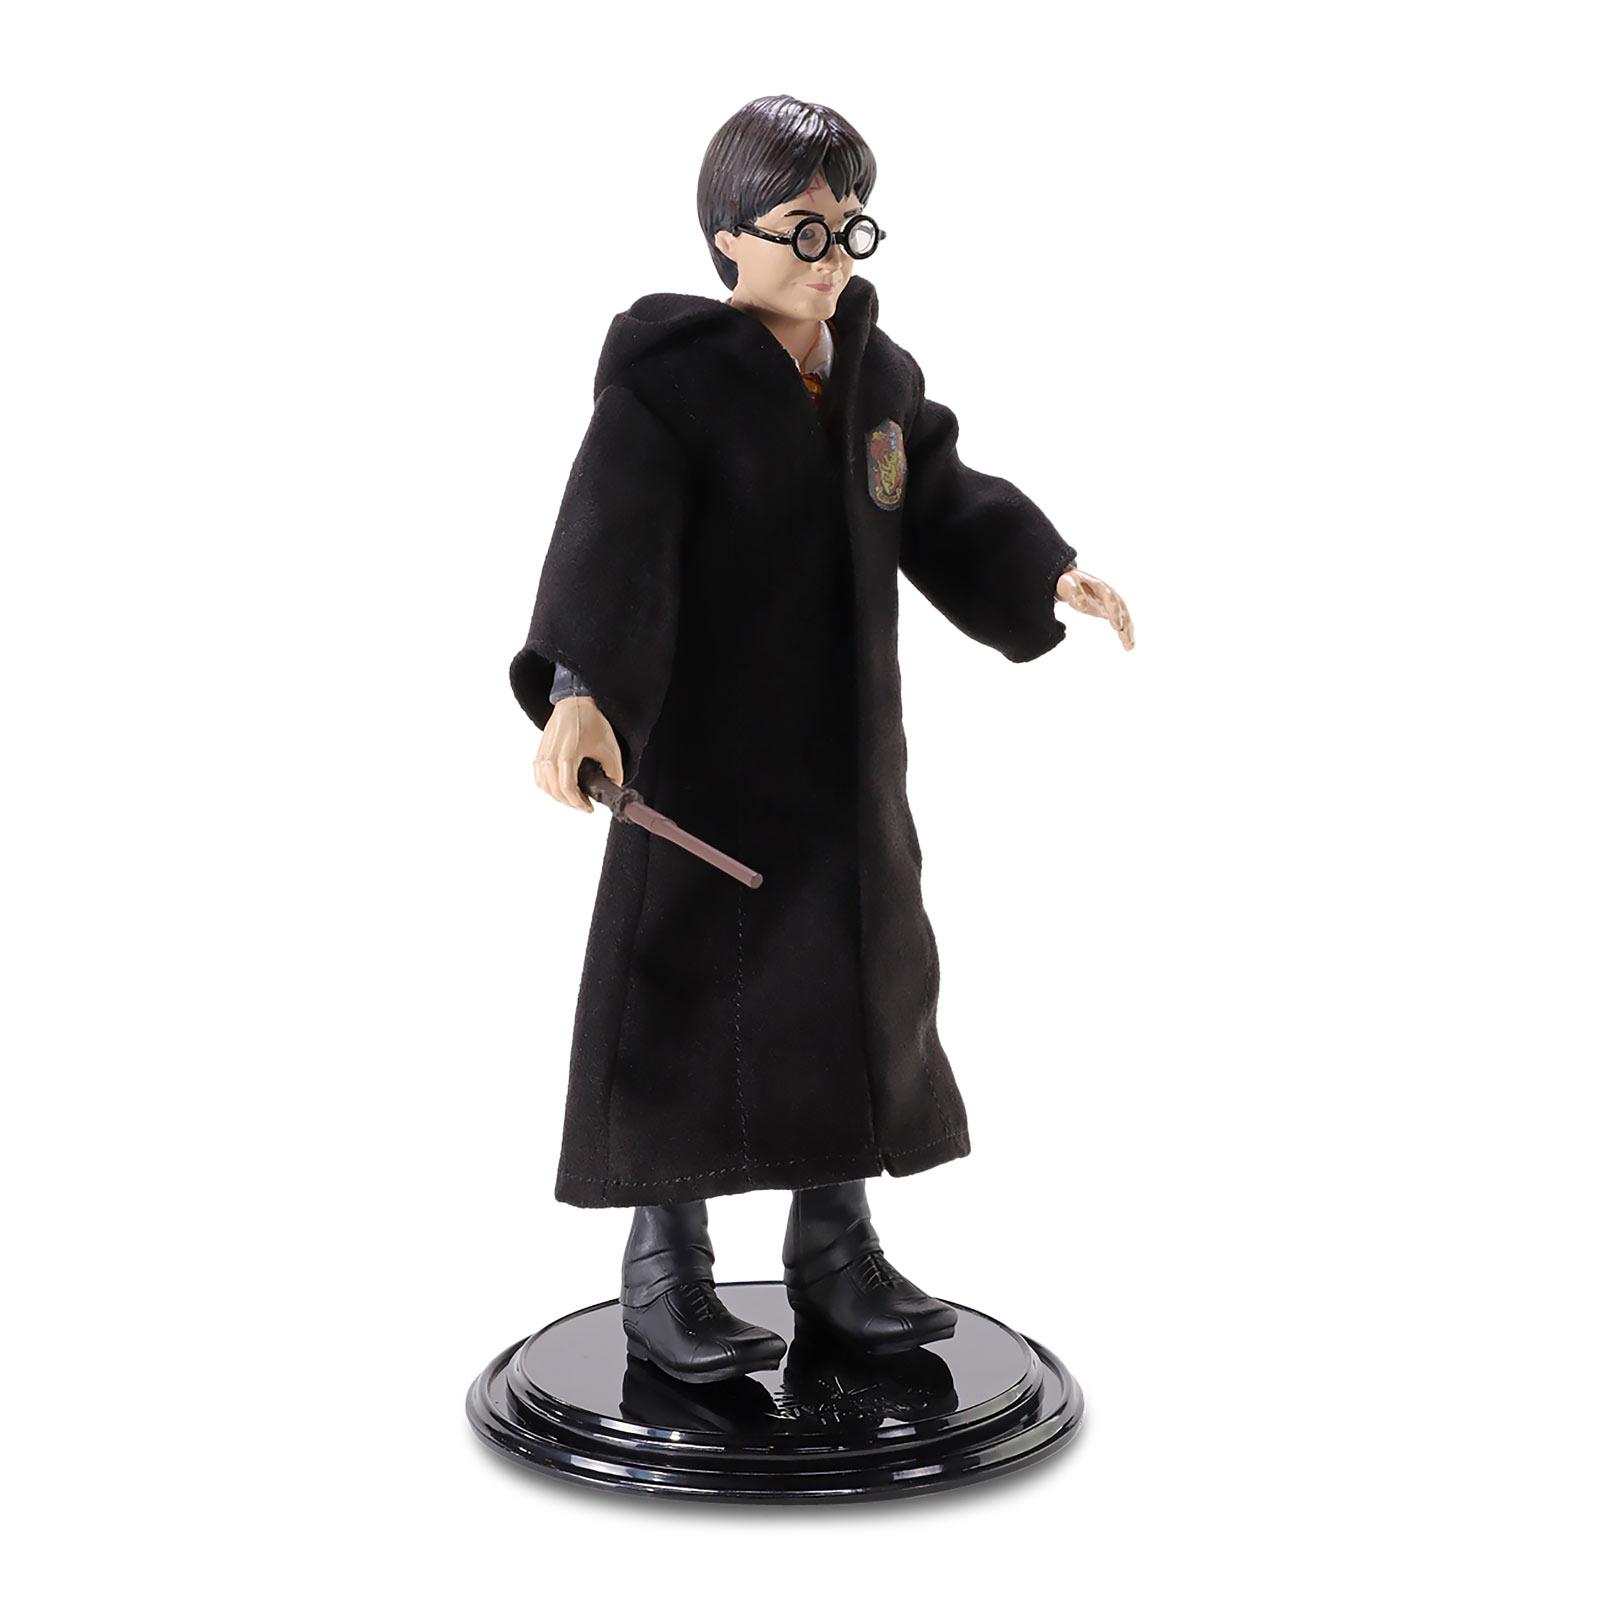 Harry Potter Bendyfigs Figur 18 cm